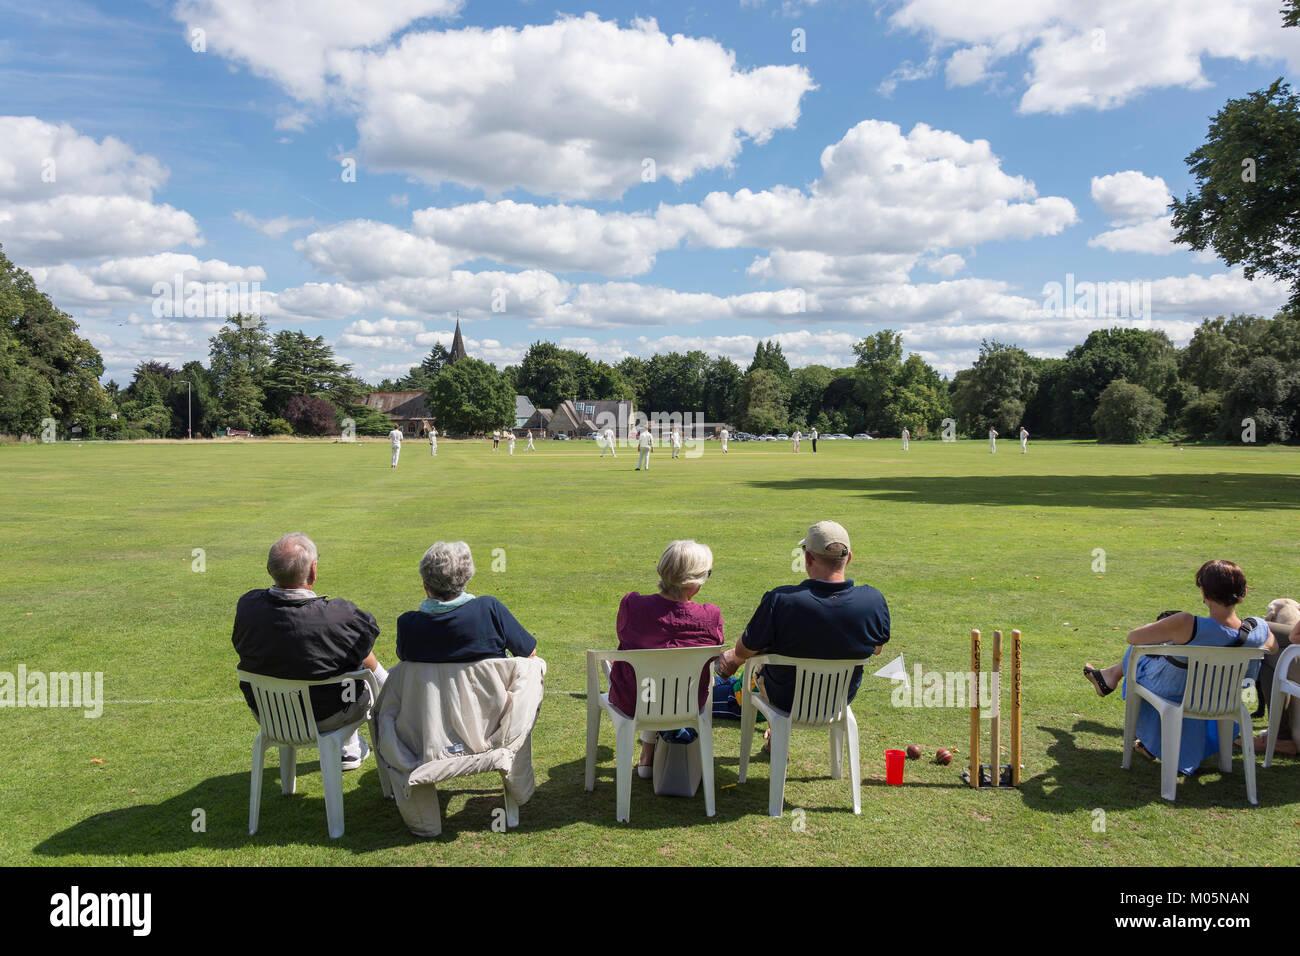 Saturday match at Chorleywood Cricket Club, Chorleywood, Hertfordshire, England, United Kingdom Stock Photo